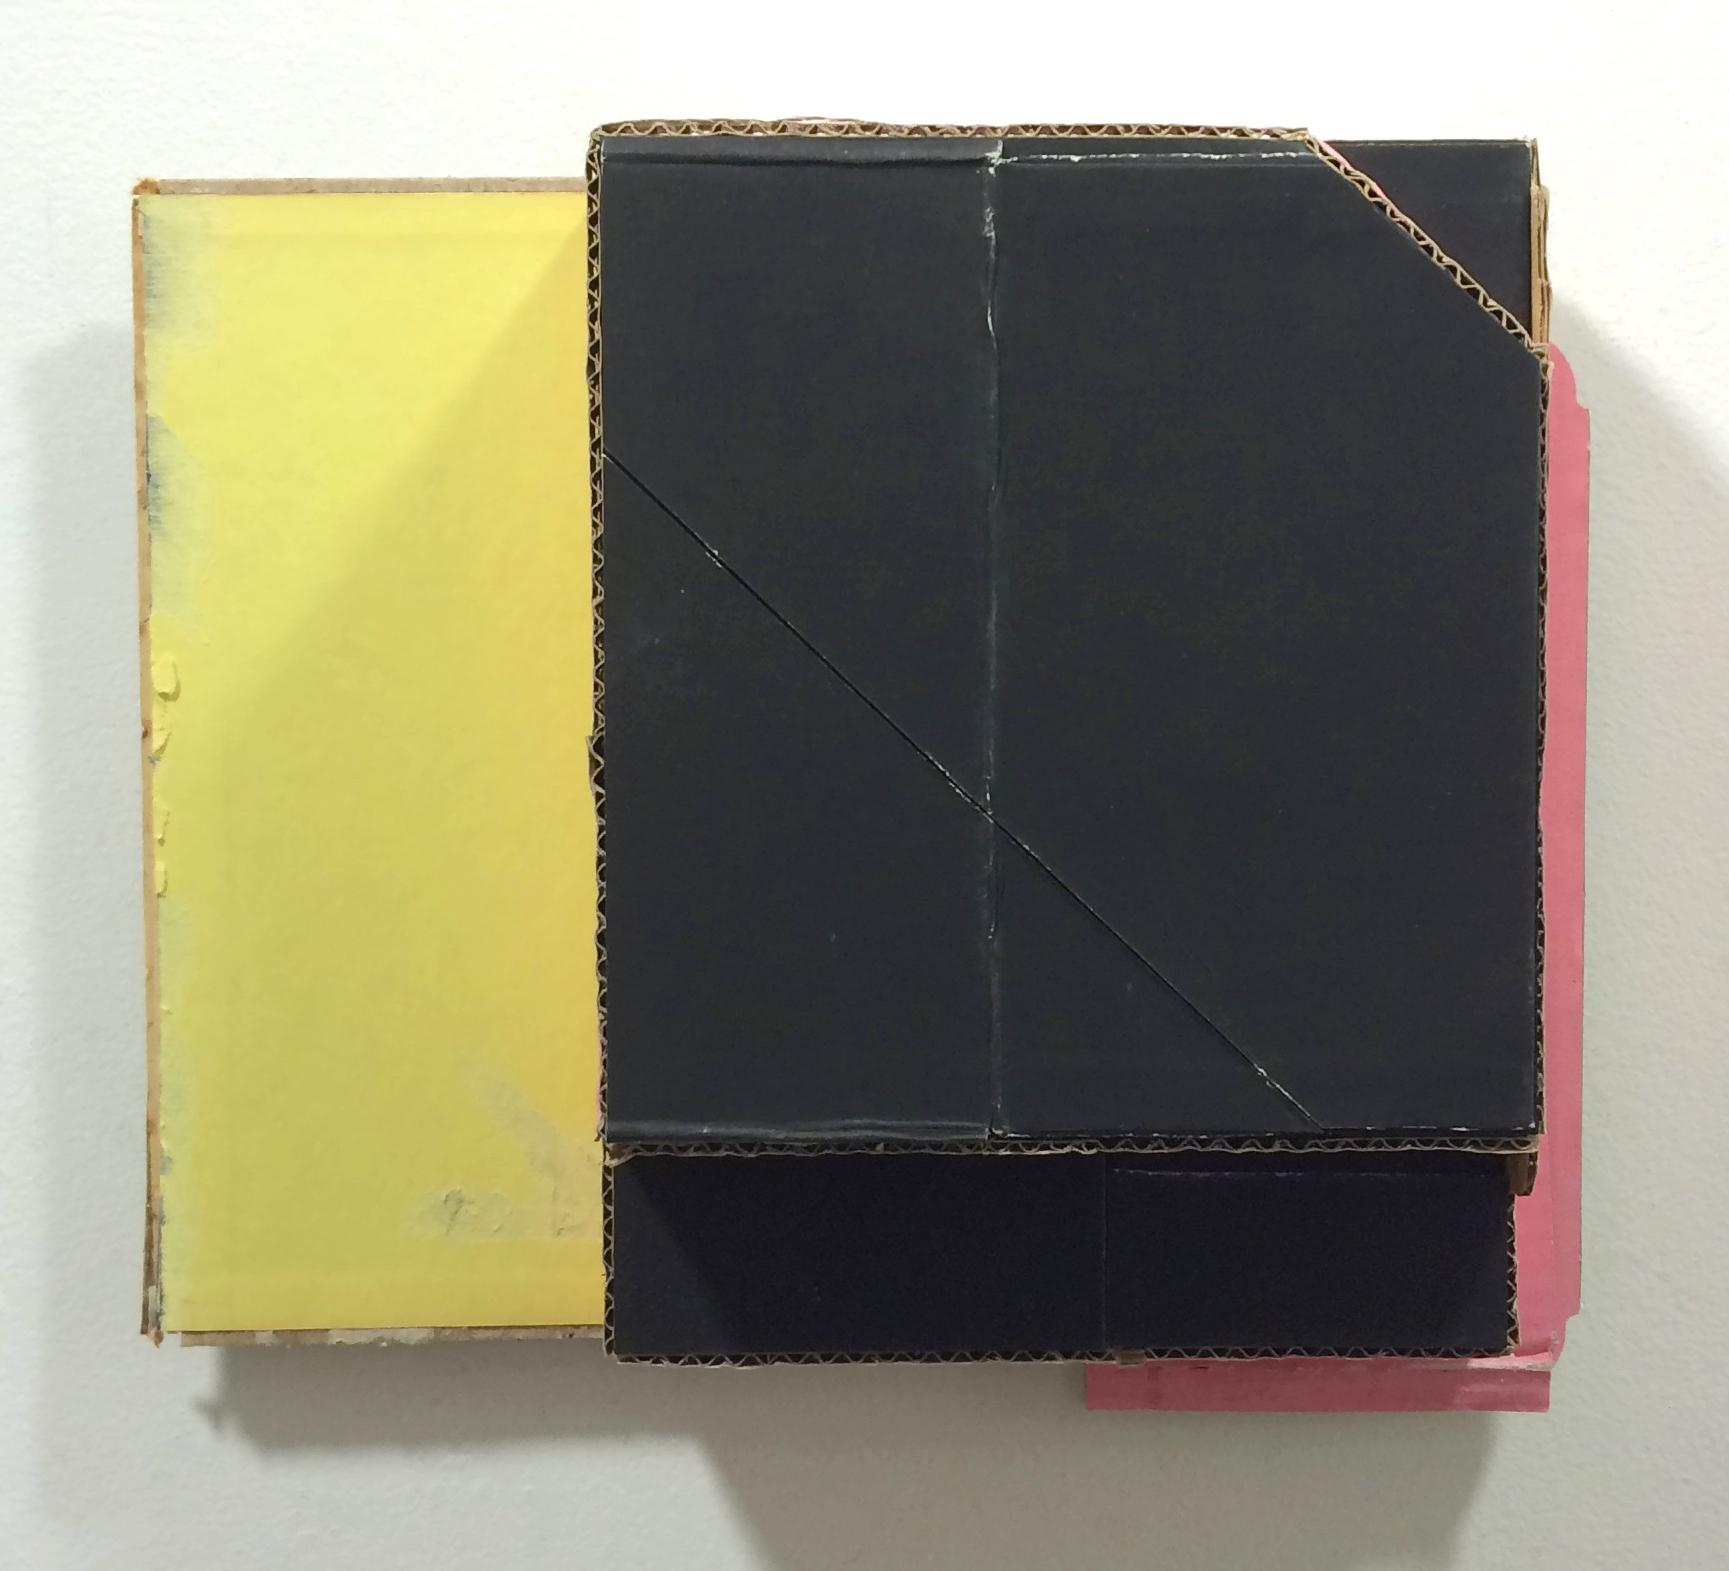 Corner Lot 3  , 2015  found (unpainted) cardboard, cut book cover  11 x 12.75 x 3.25 inches